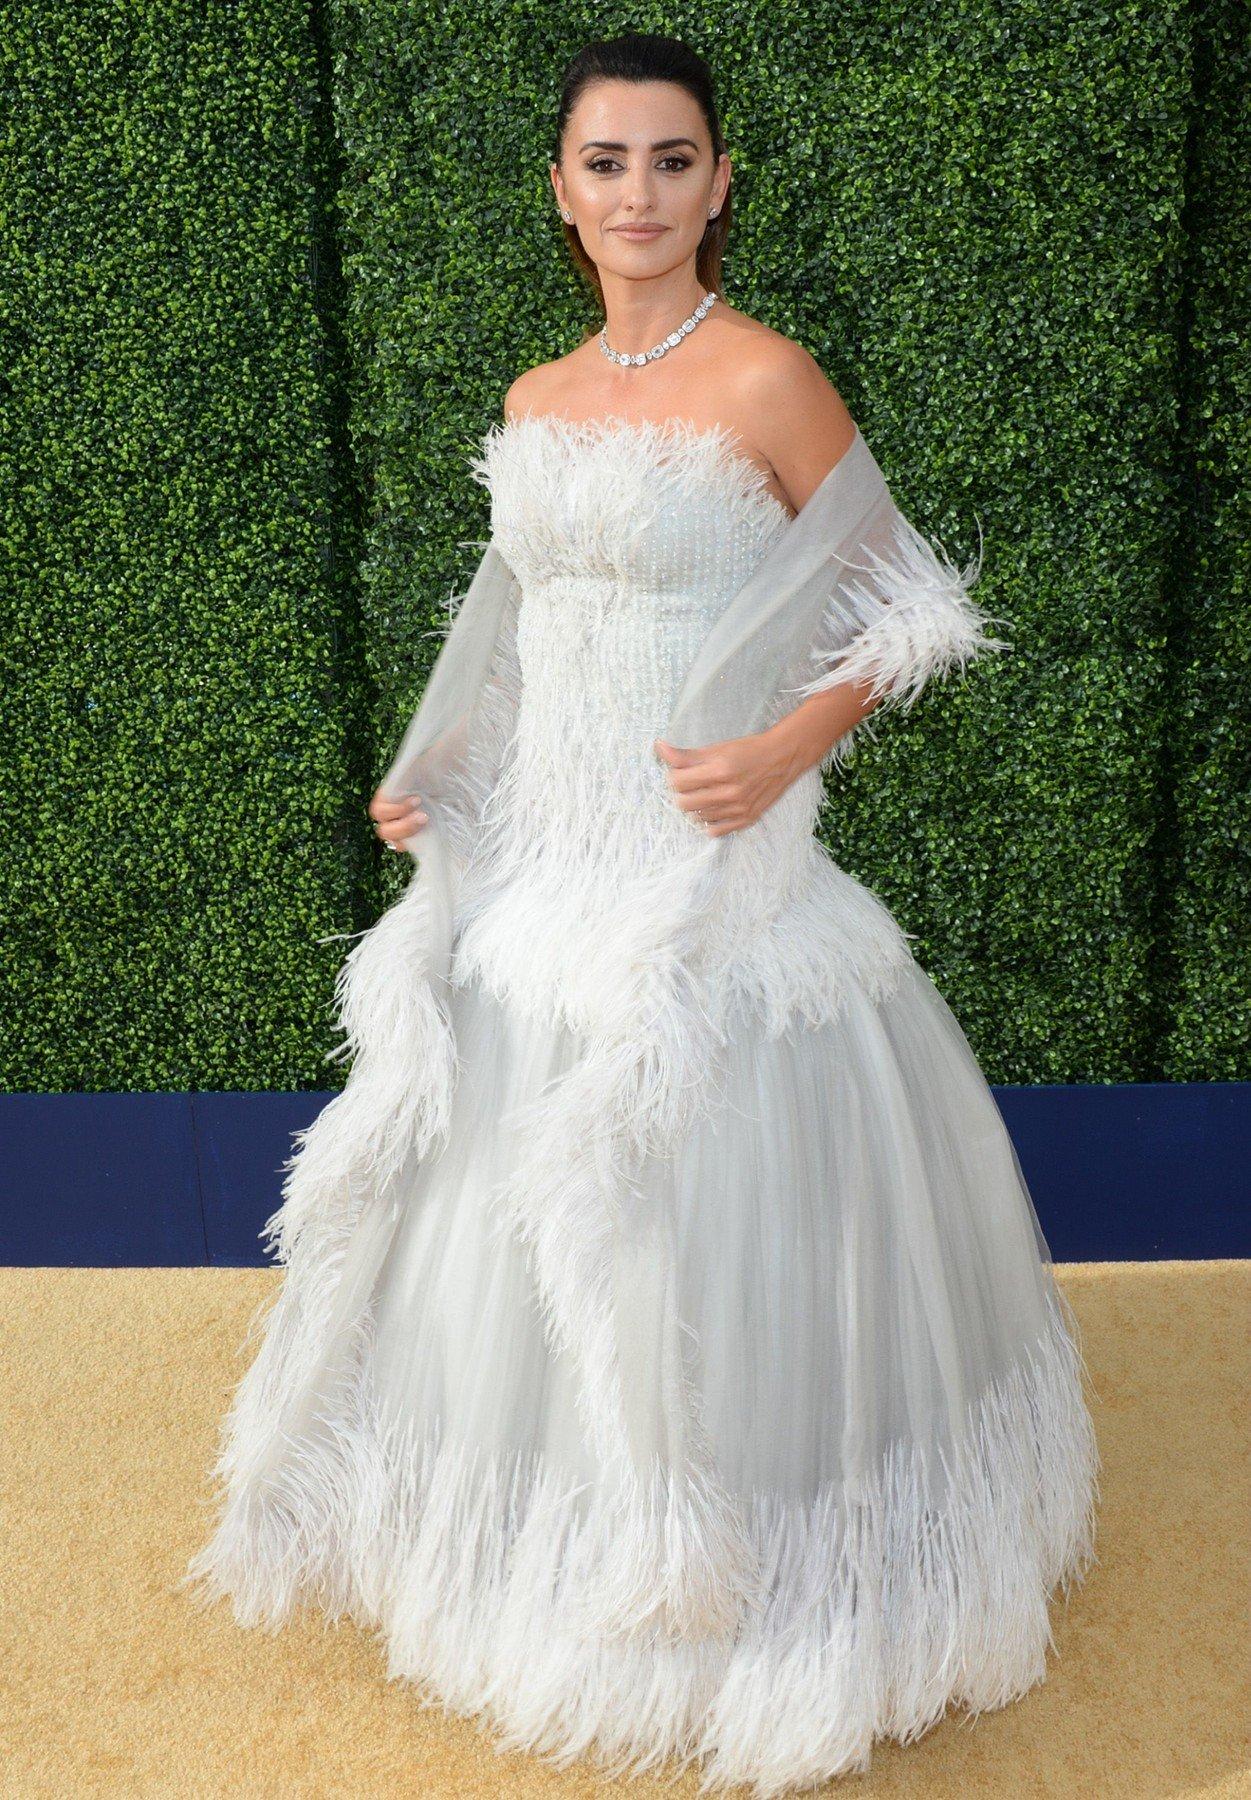 Penelope Cruz 70th Primetime Emmy Awards, Arrivals, Los Angeles, USA - 17 Sep 2018 70th Annual Primetime Emmy Awards - Arrivals, Image: 387156292, License: Rights-managed, Restrictions: , Model Release: no, Credit line: Profimedia, TEMP Rex Features